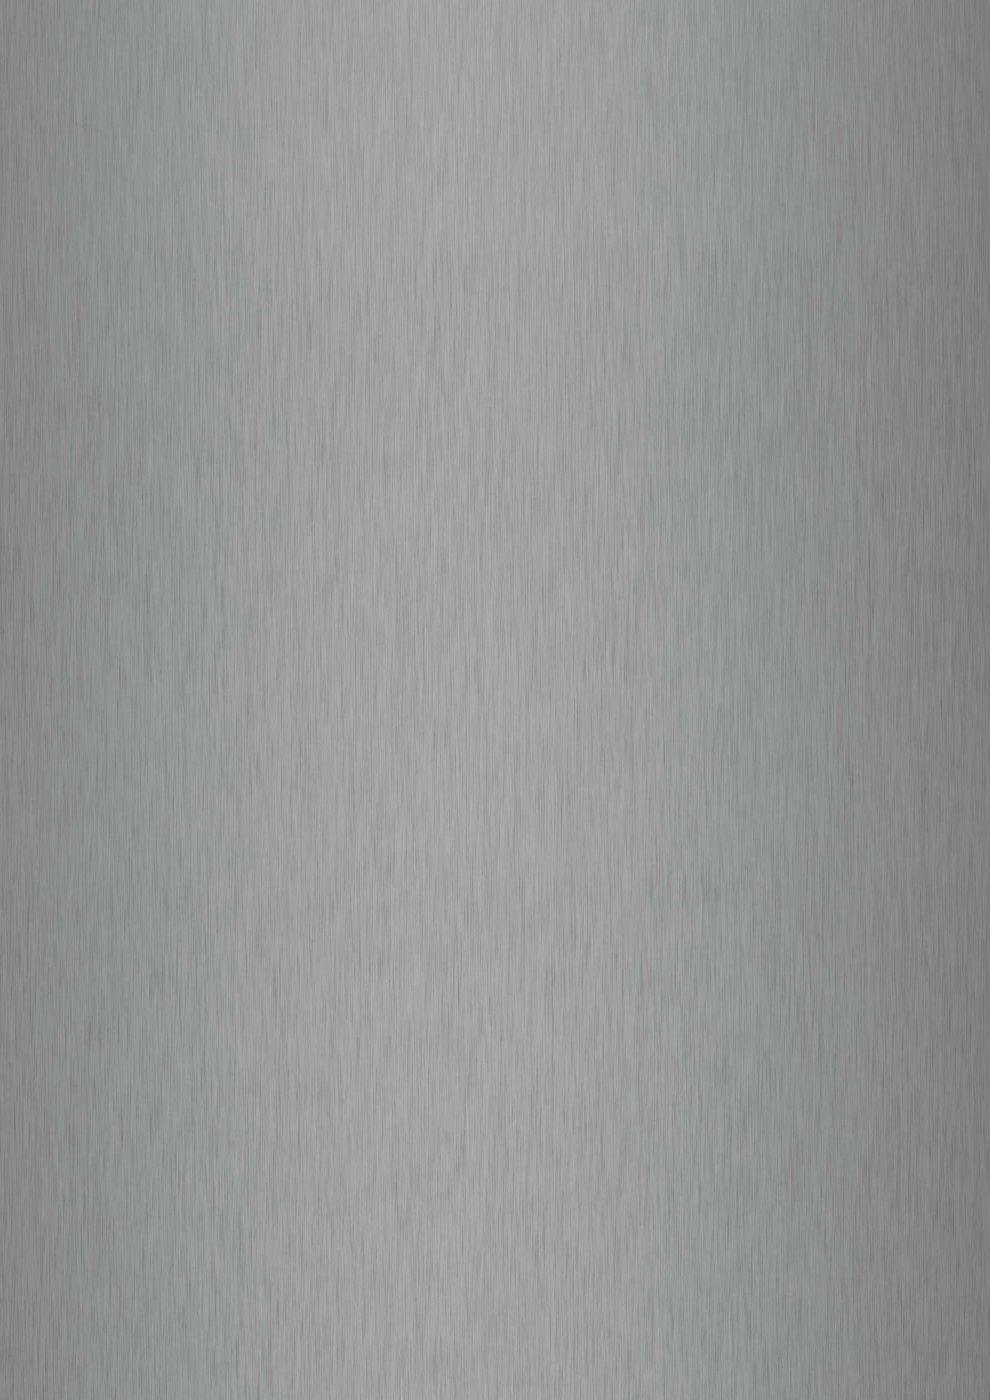 https://www.vitrum-dresden.de/wp-content/uploads/2018/08/5_Ruecken_web-990x1400.jpg